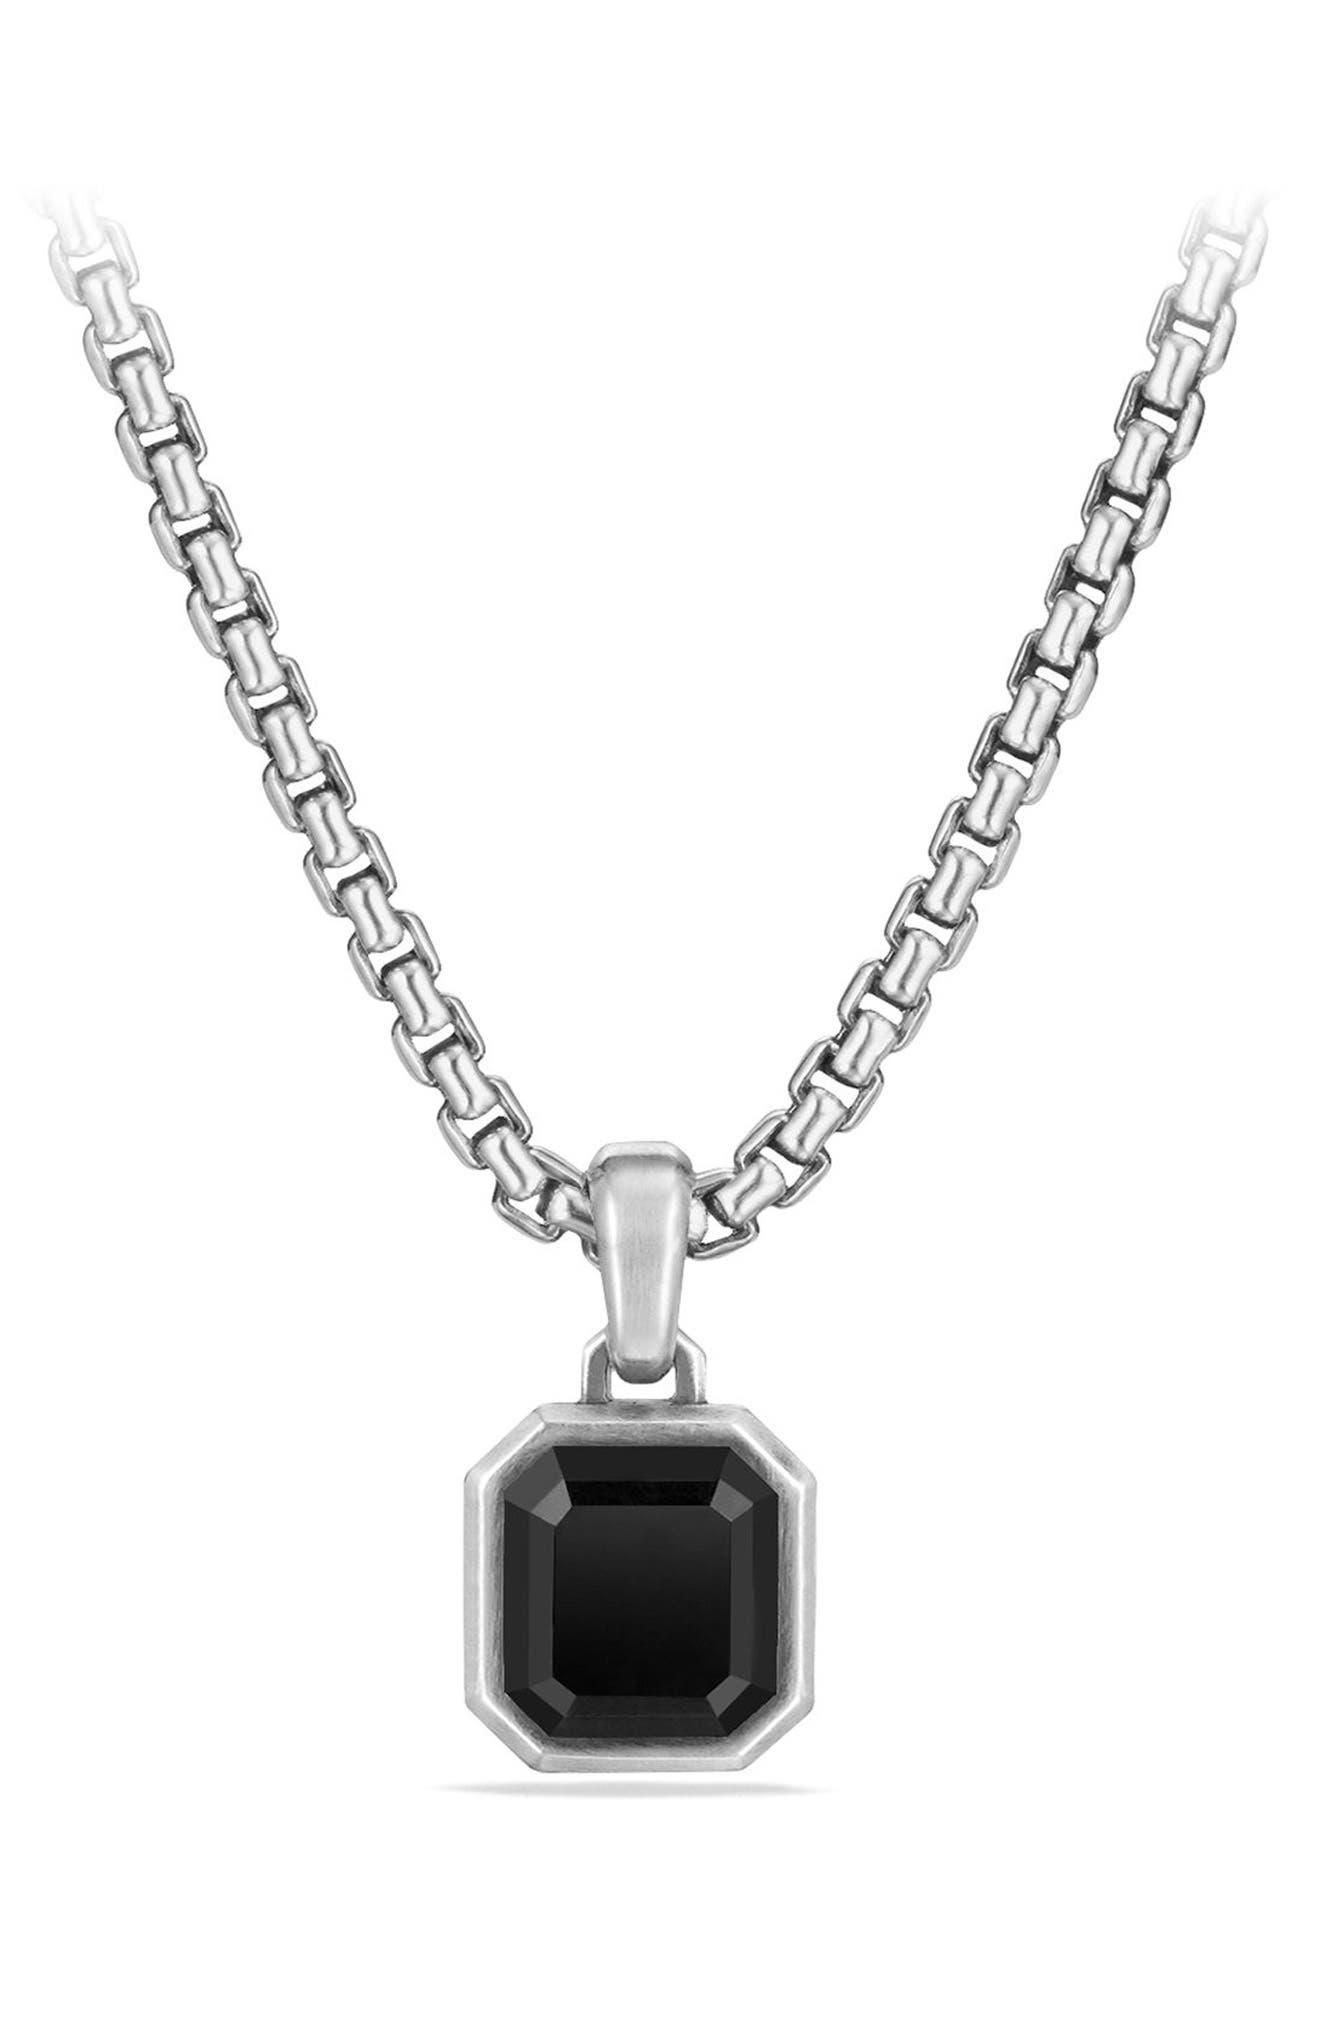 Emerald Cut Semiprecious Stone Amulet,                         Main,                         color, SILVER/ BLACK ONYX